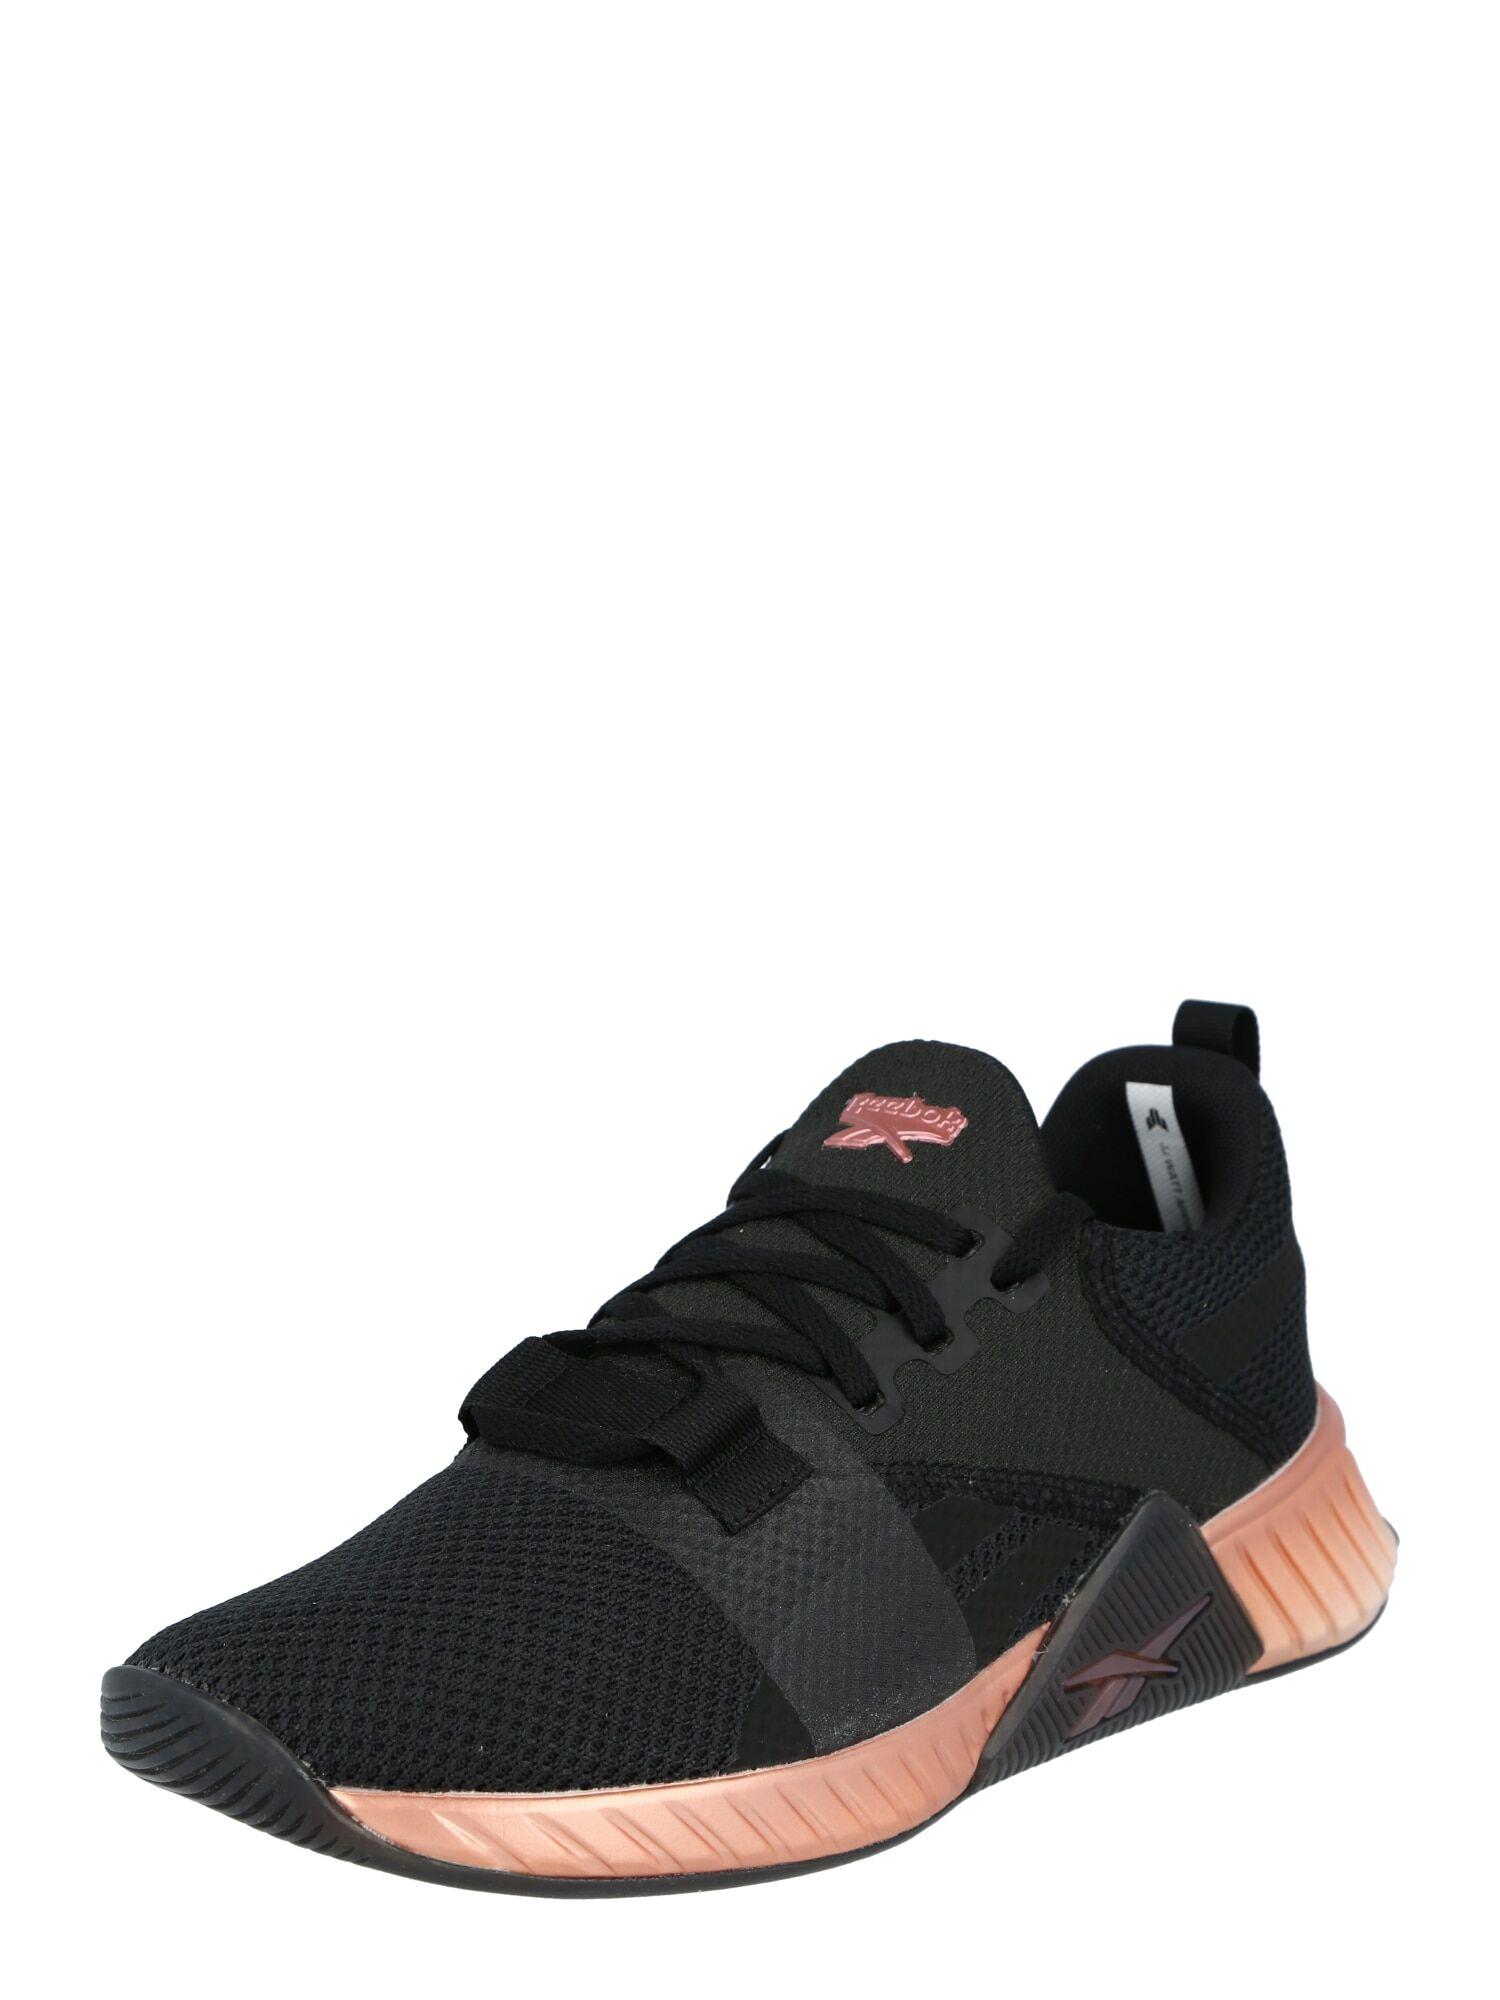 REEBOK Chaussure de sport 'FLASHFILM TRAIN 2.0'  - Noir - Taille: 3.5 - female